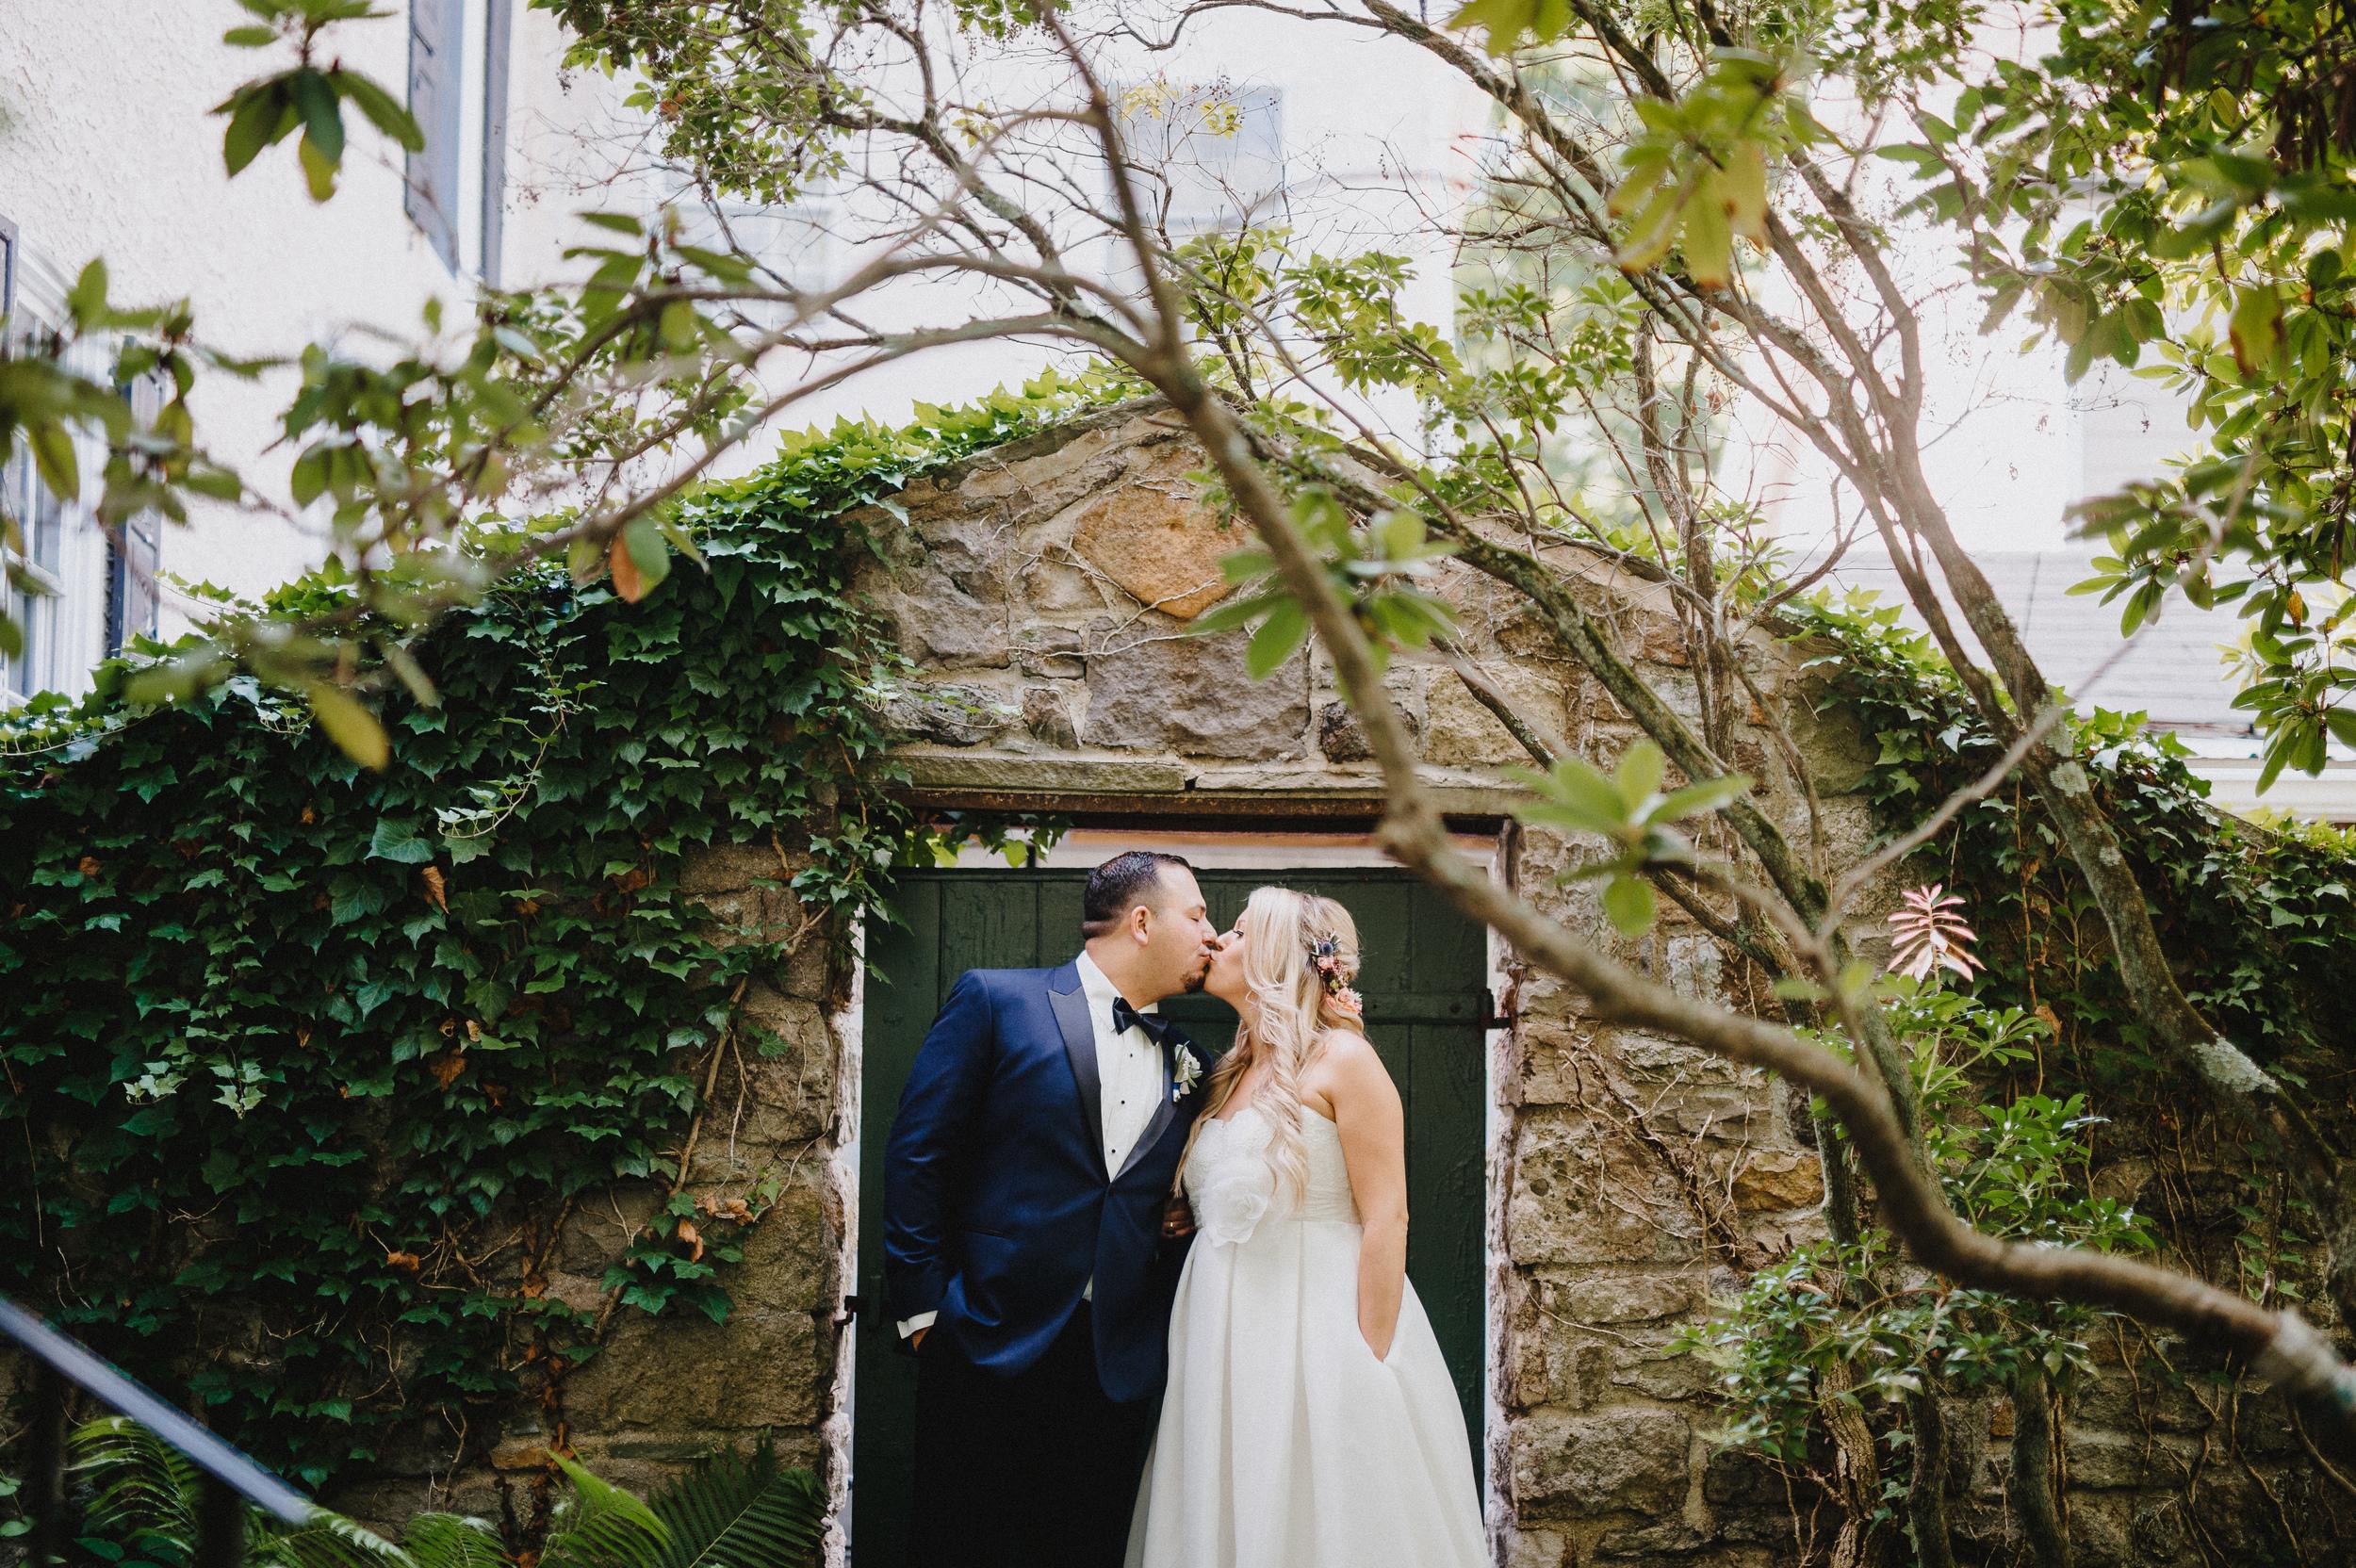 holly-hedge-estate-wedding-photographer-pat-robinson-photography-40.jpg